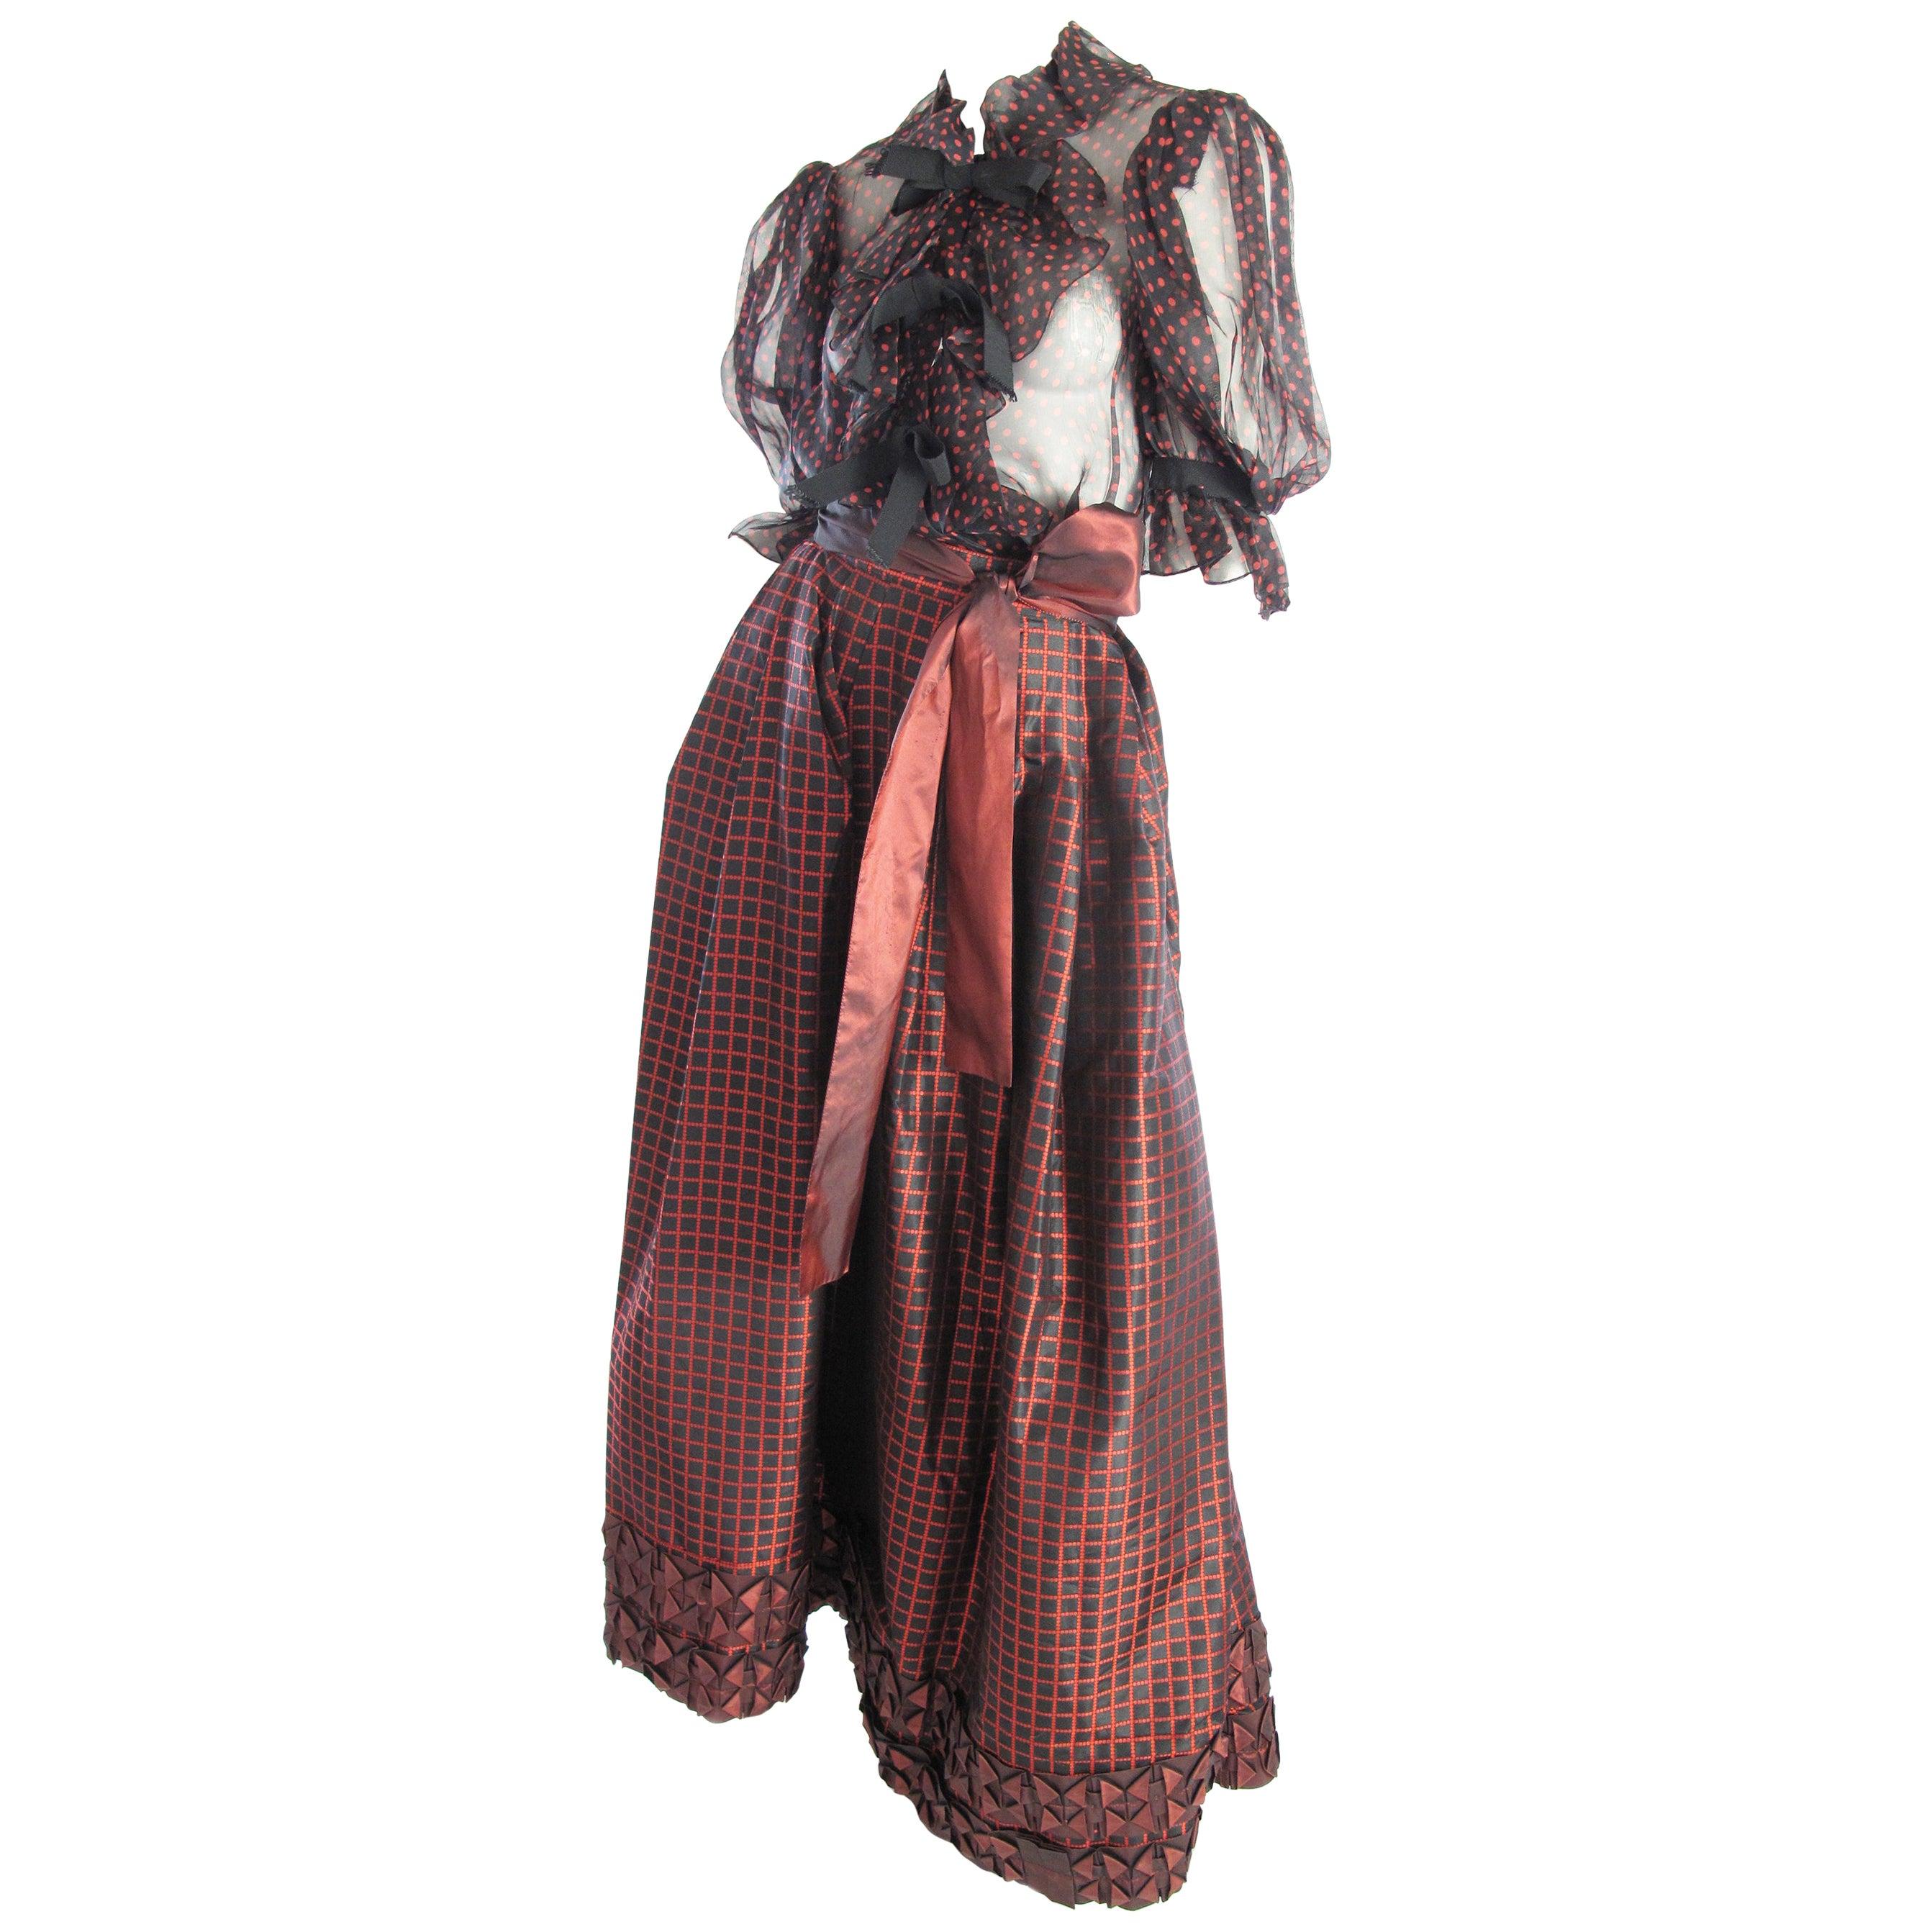 1980s Yves Saint Laurent Rive Gauche Taffeta Evening Skirt and Sheer Bow Blouse